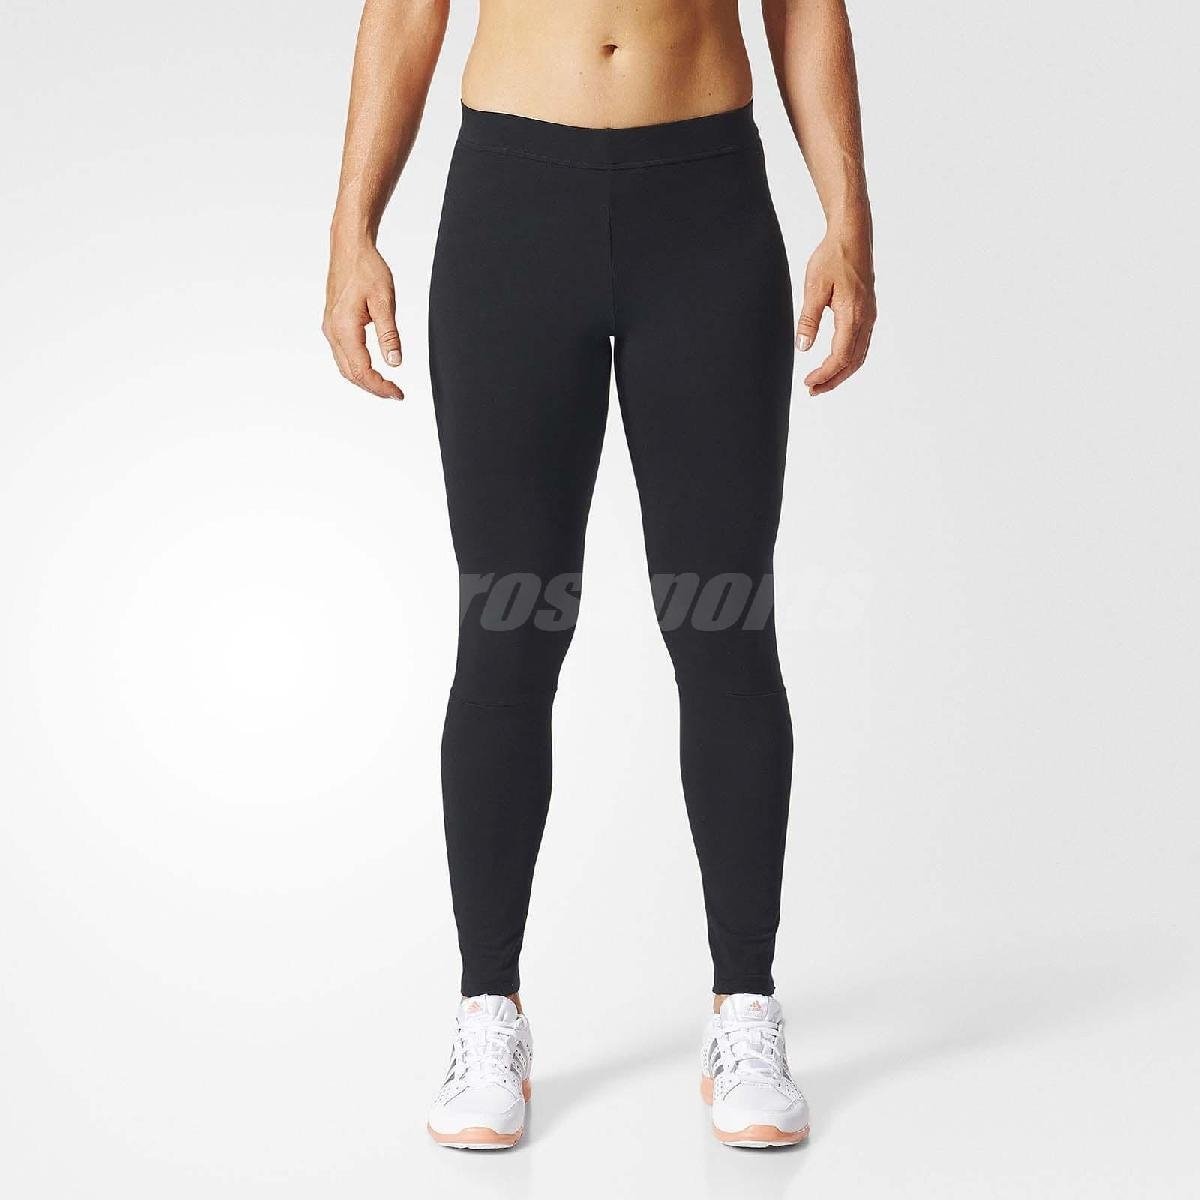 adidas束褲Essentials Linear Tights基本款女款黑白緊身運動長褲Legging內搭PUMP306 S97155